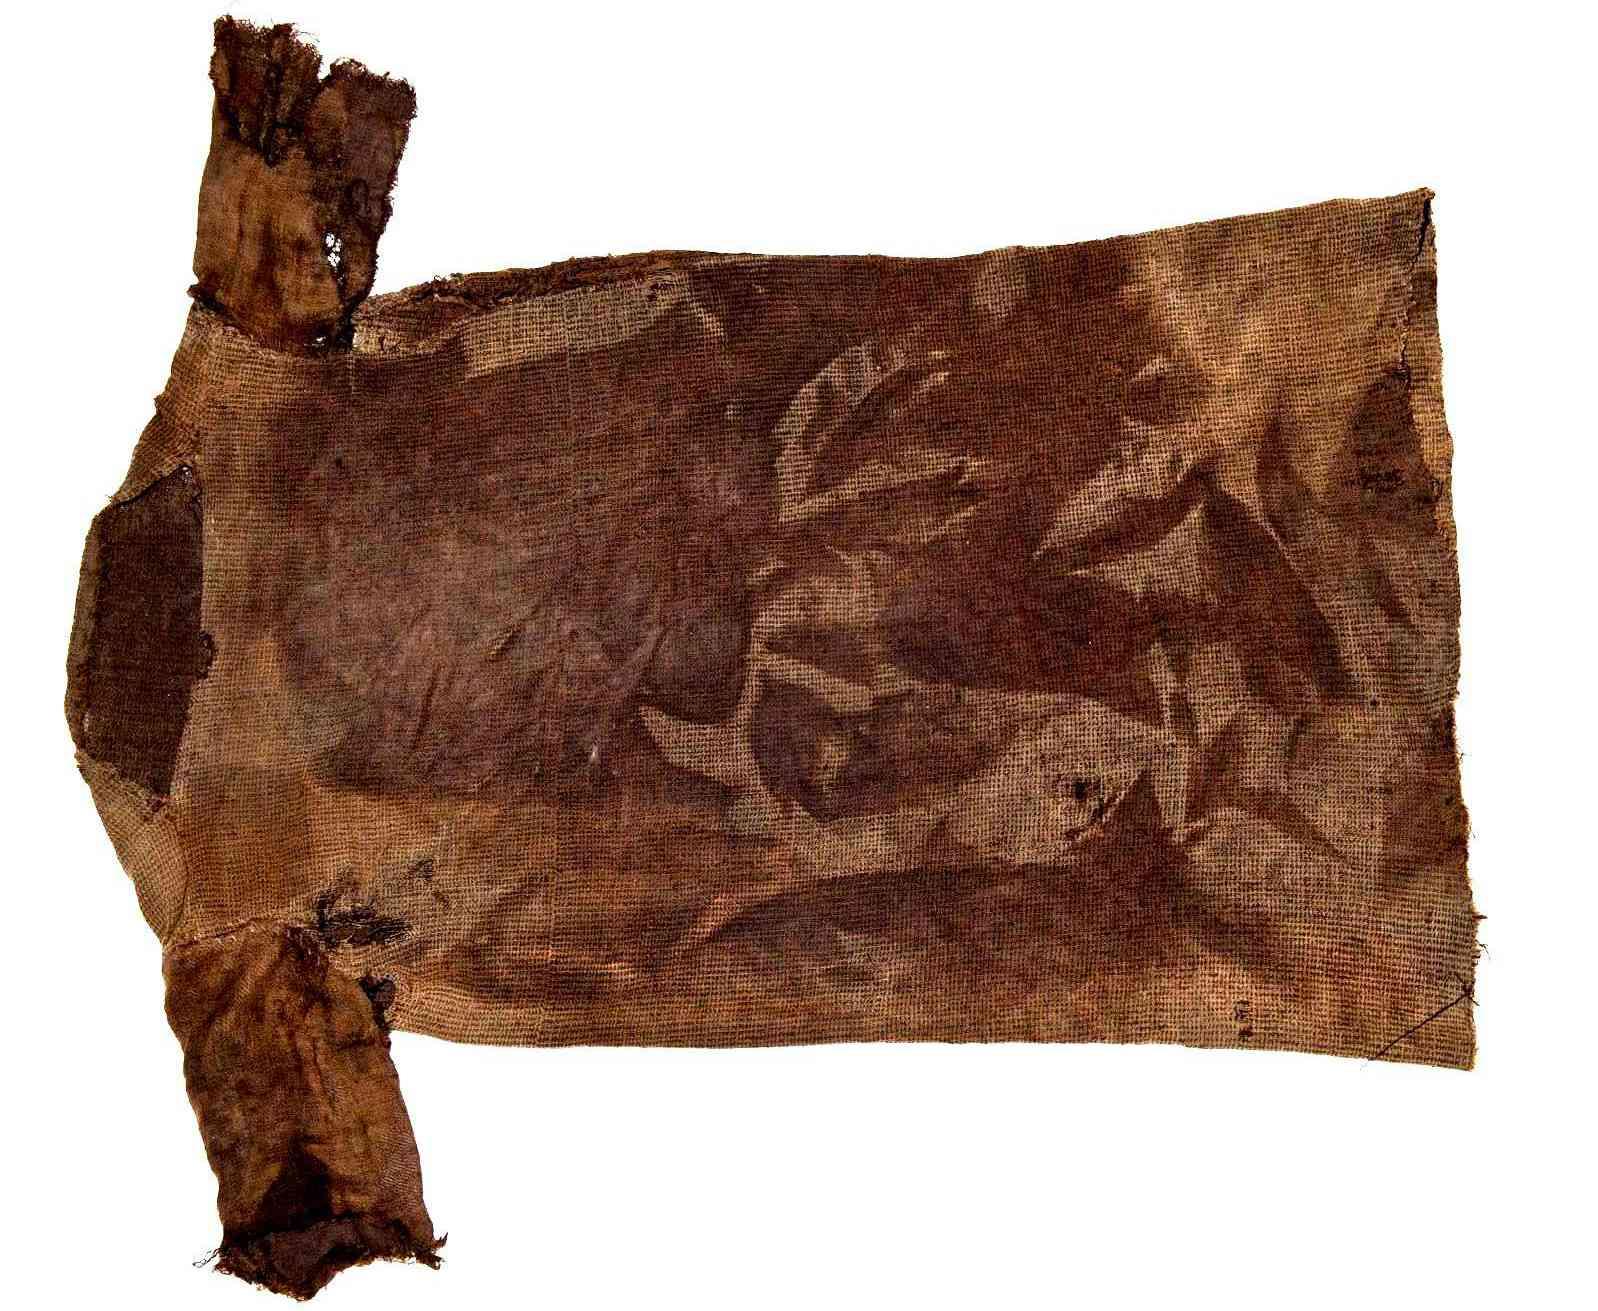 Iron Age tunic